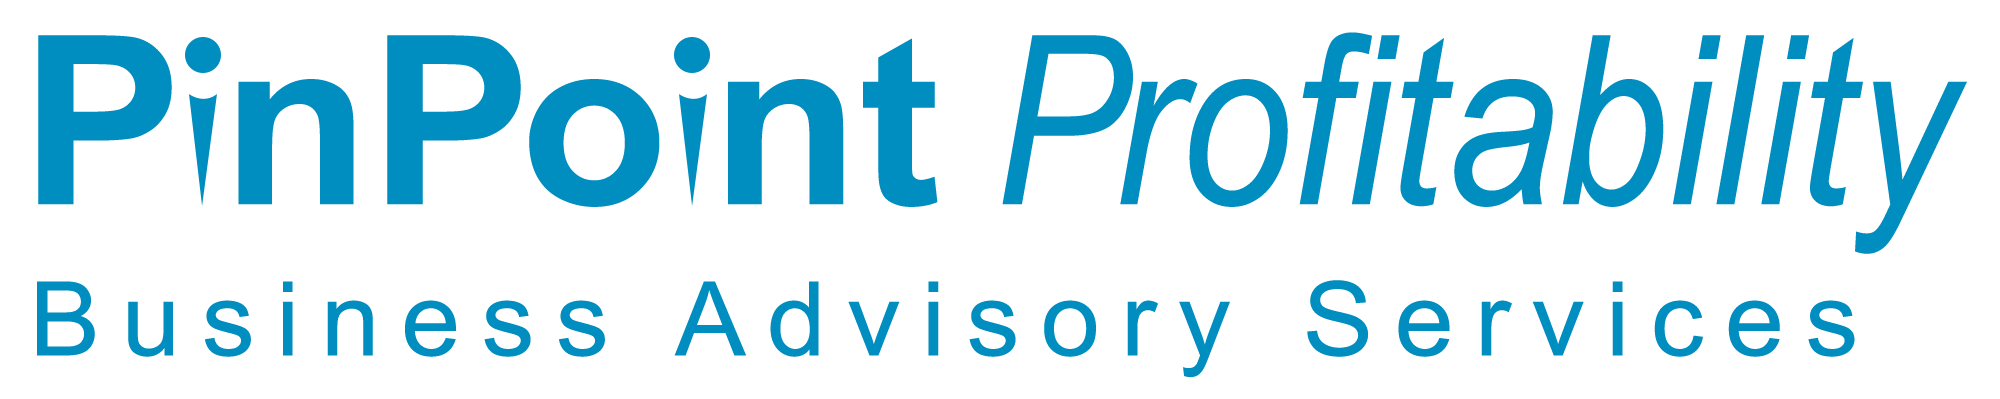 Pinpoint Profitability